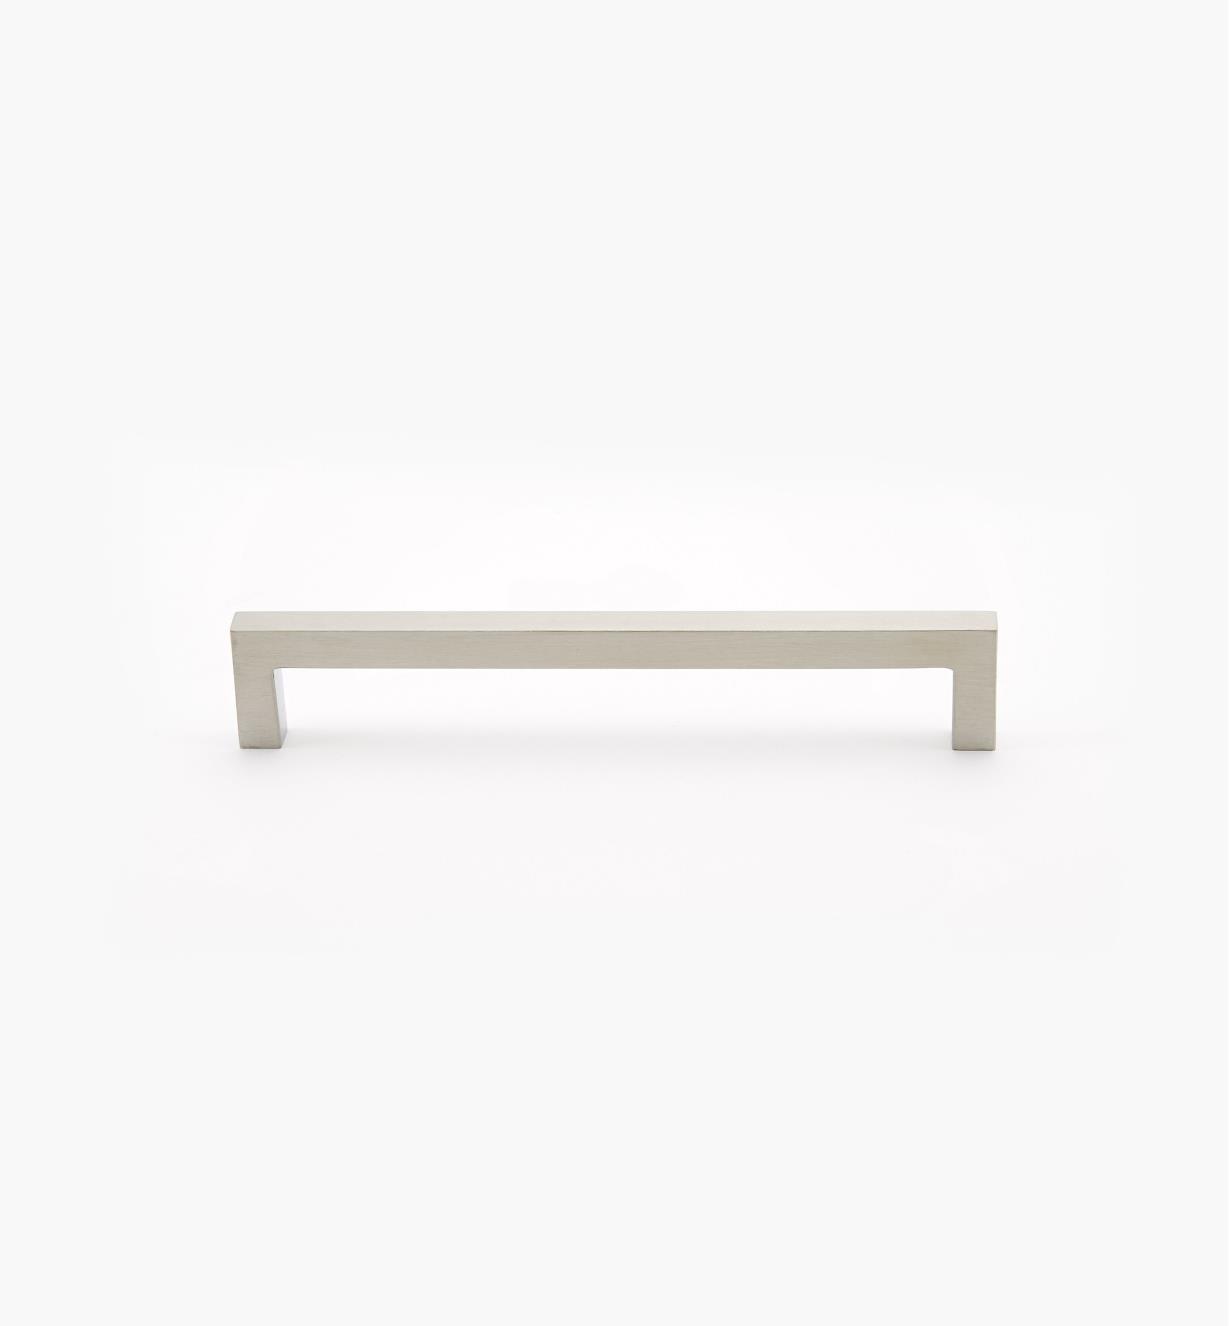 01W8413 - Poignée carrée en acier inoxydable, 160mm